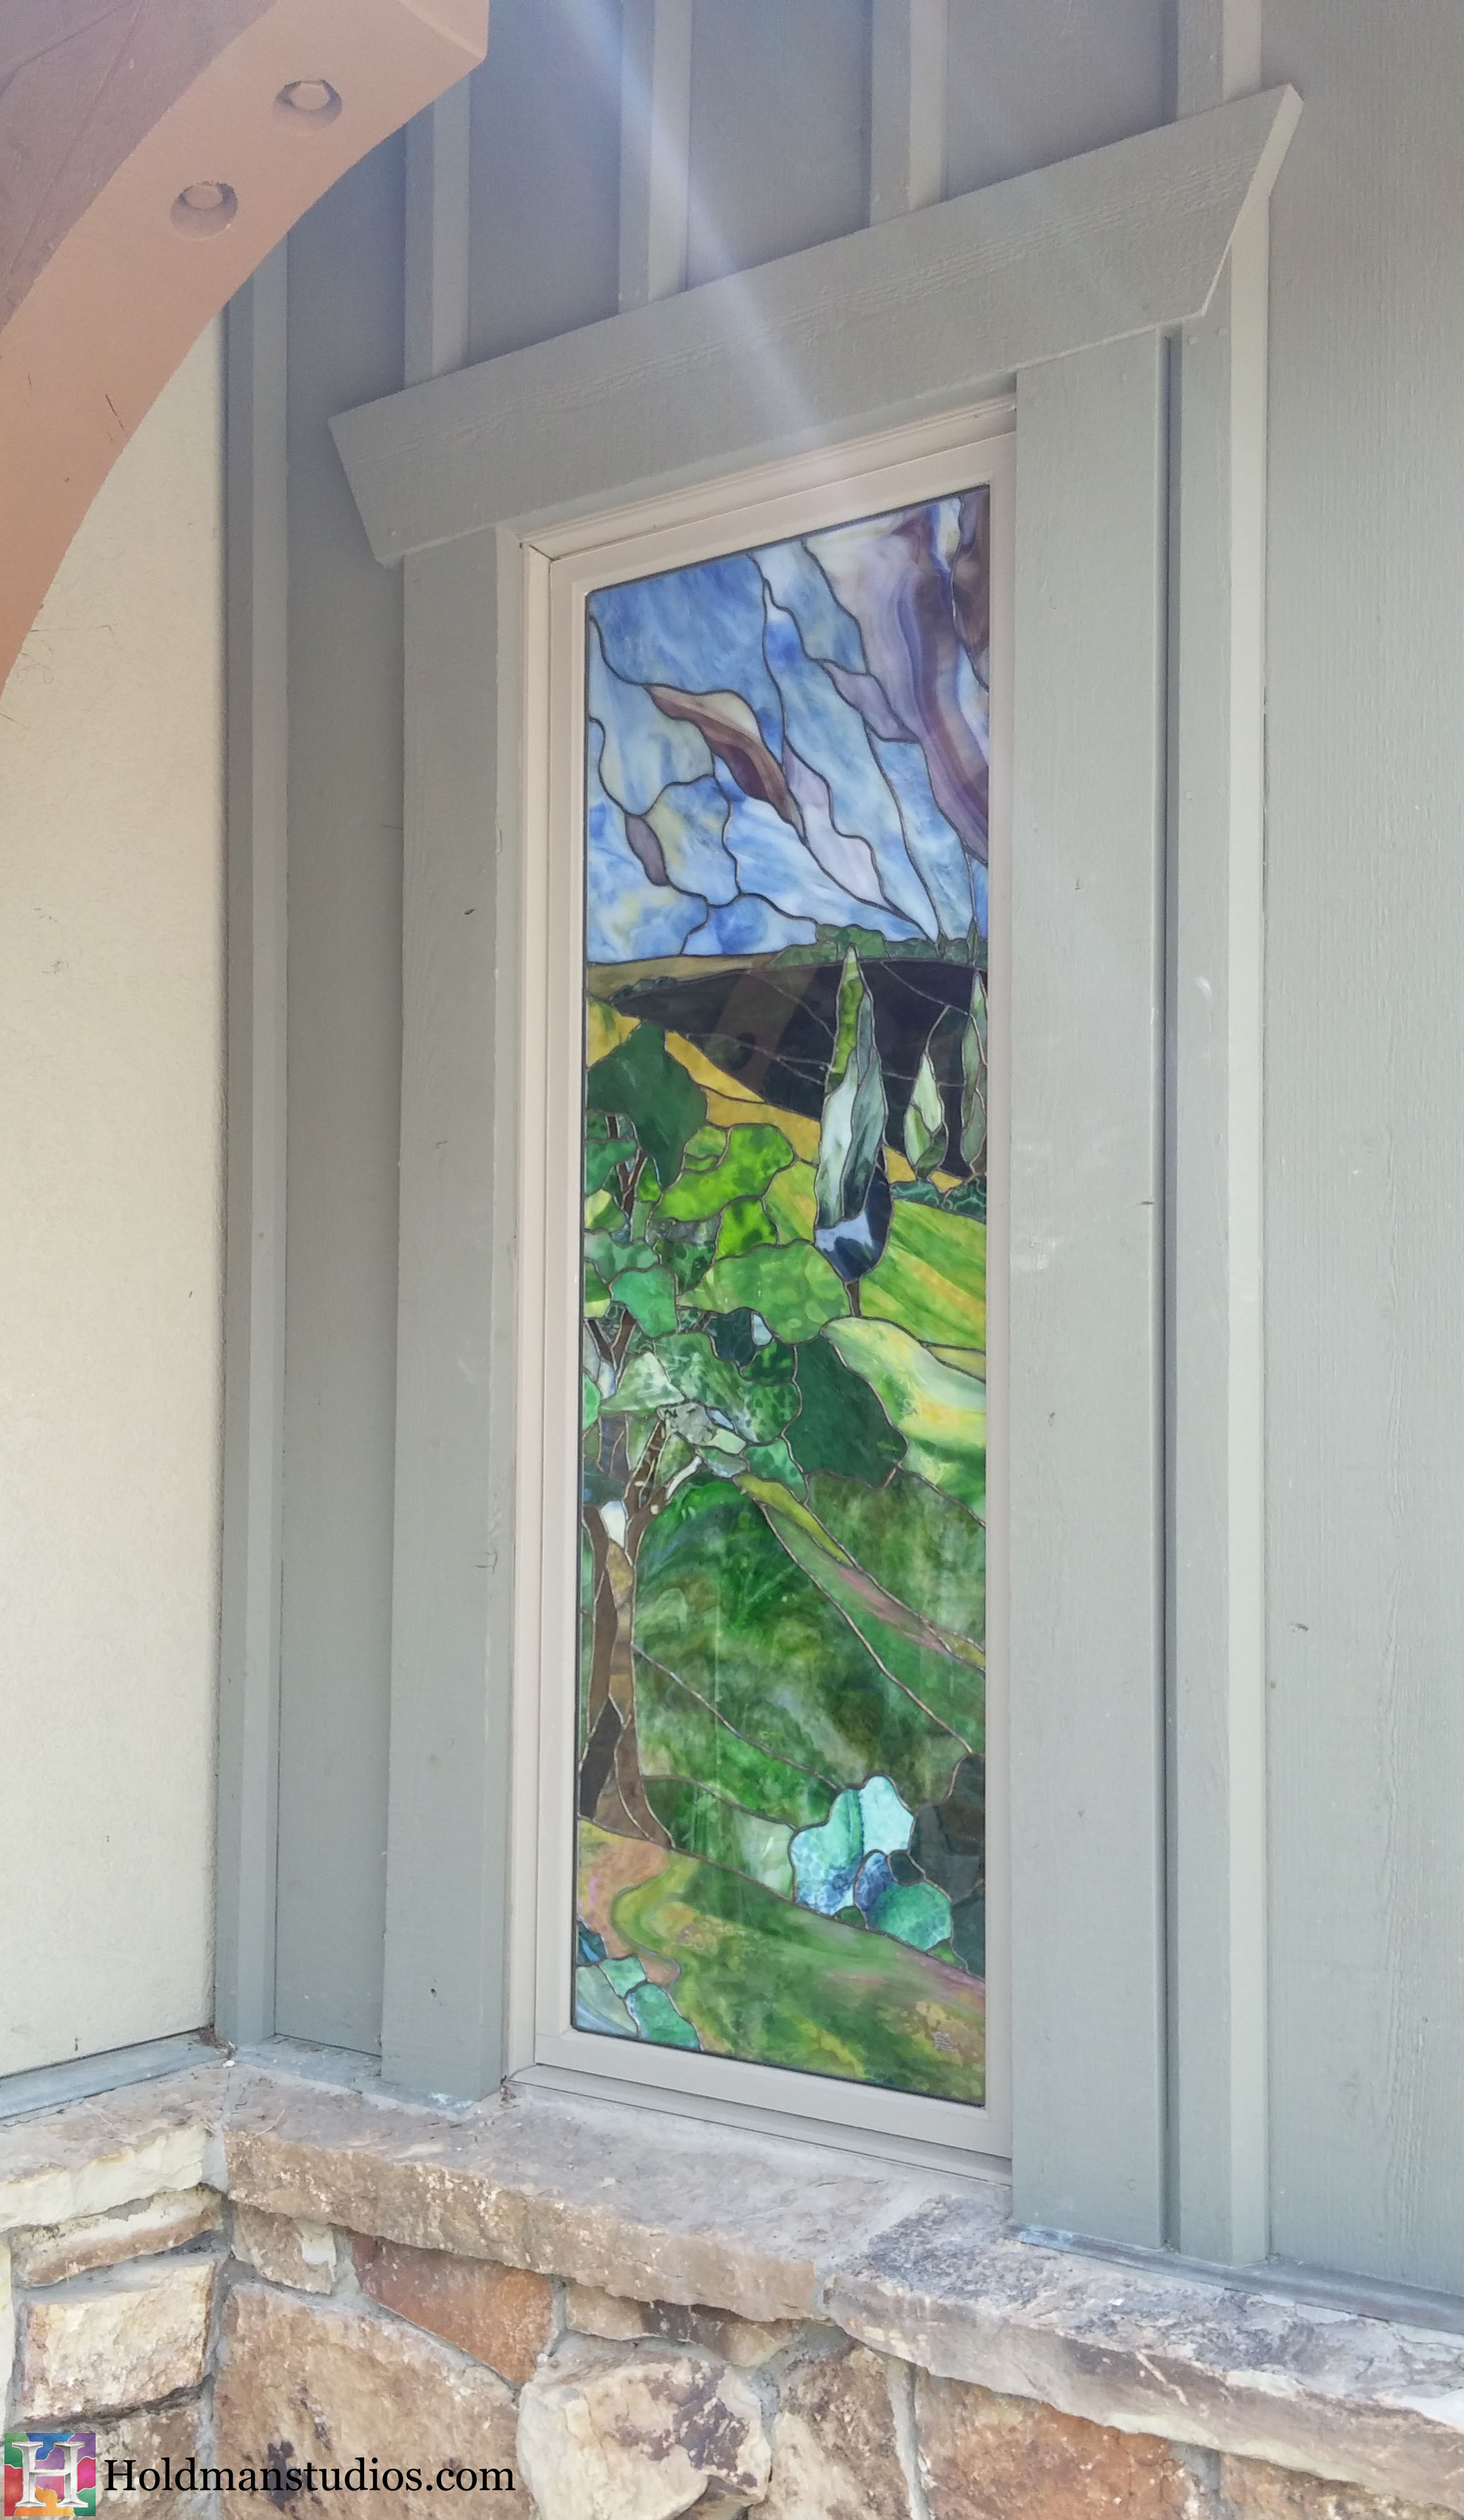 Holdman-Studios-Stained-Glass-Window-Landscape-Trees-Hill-Sky2.jpg